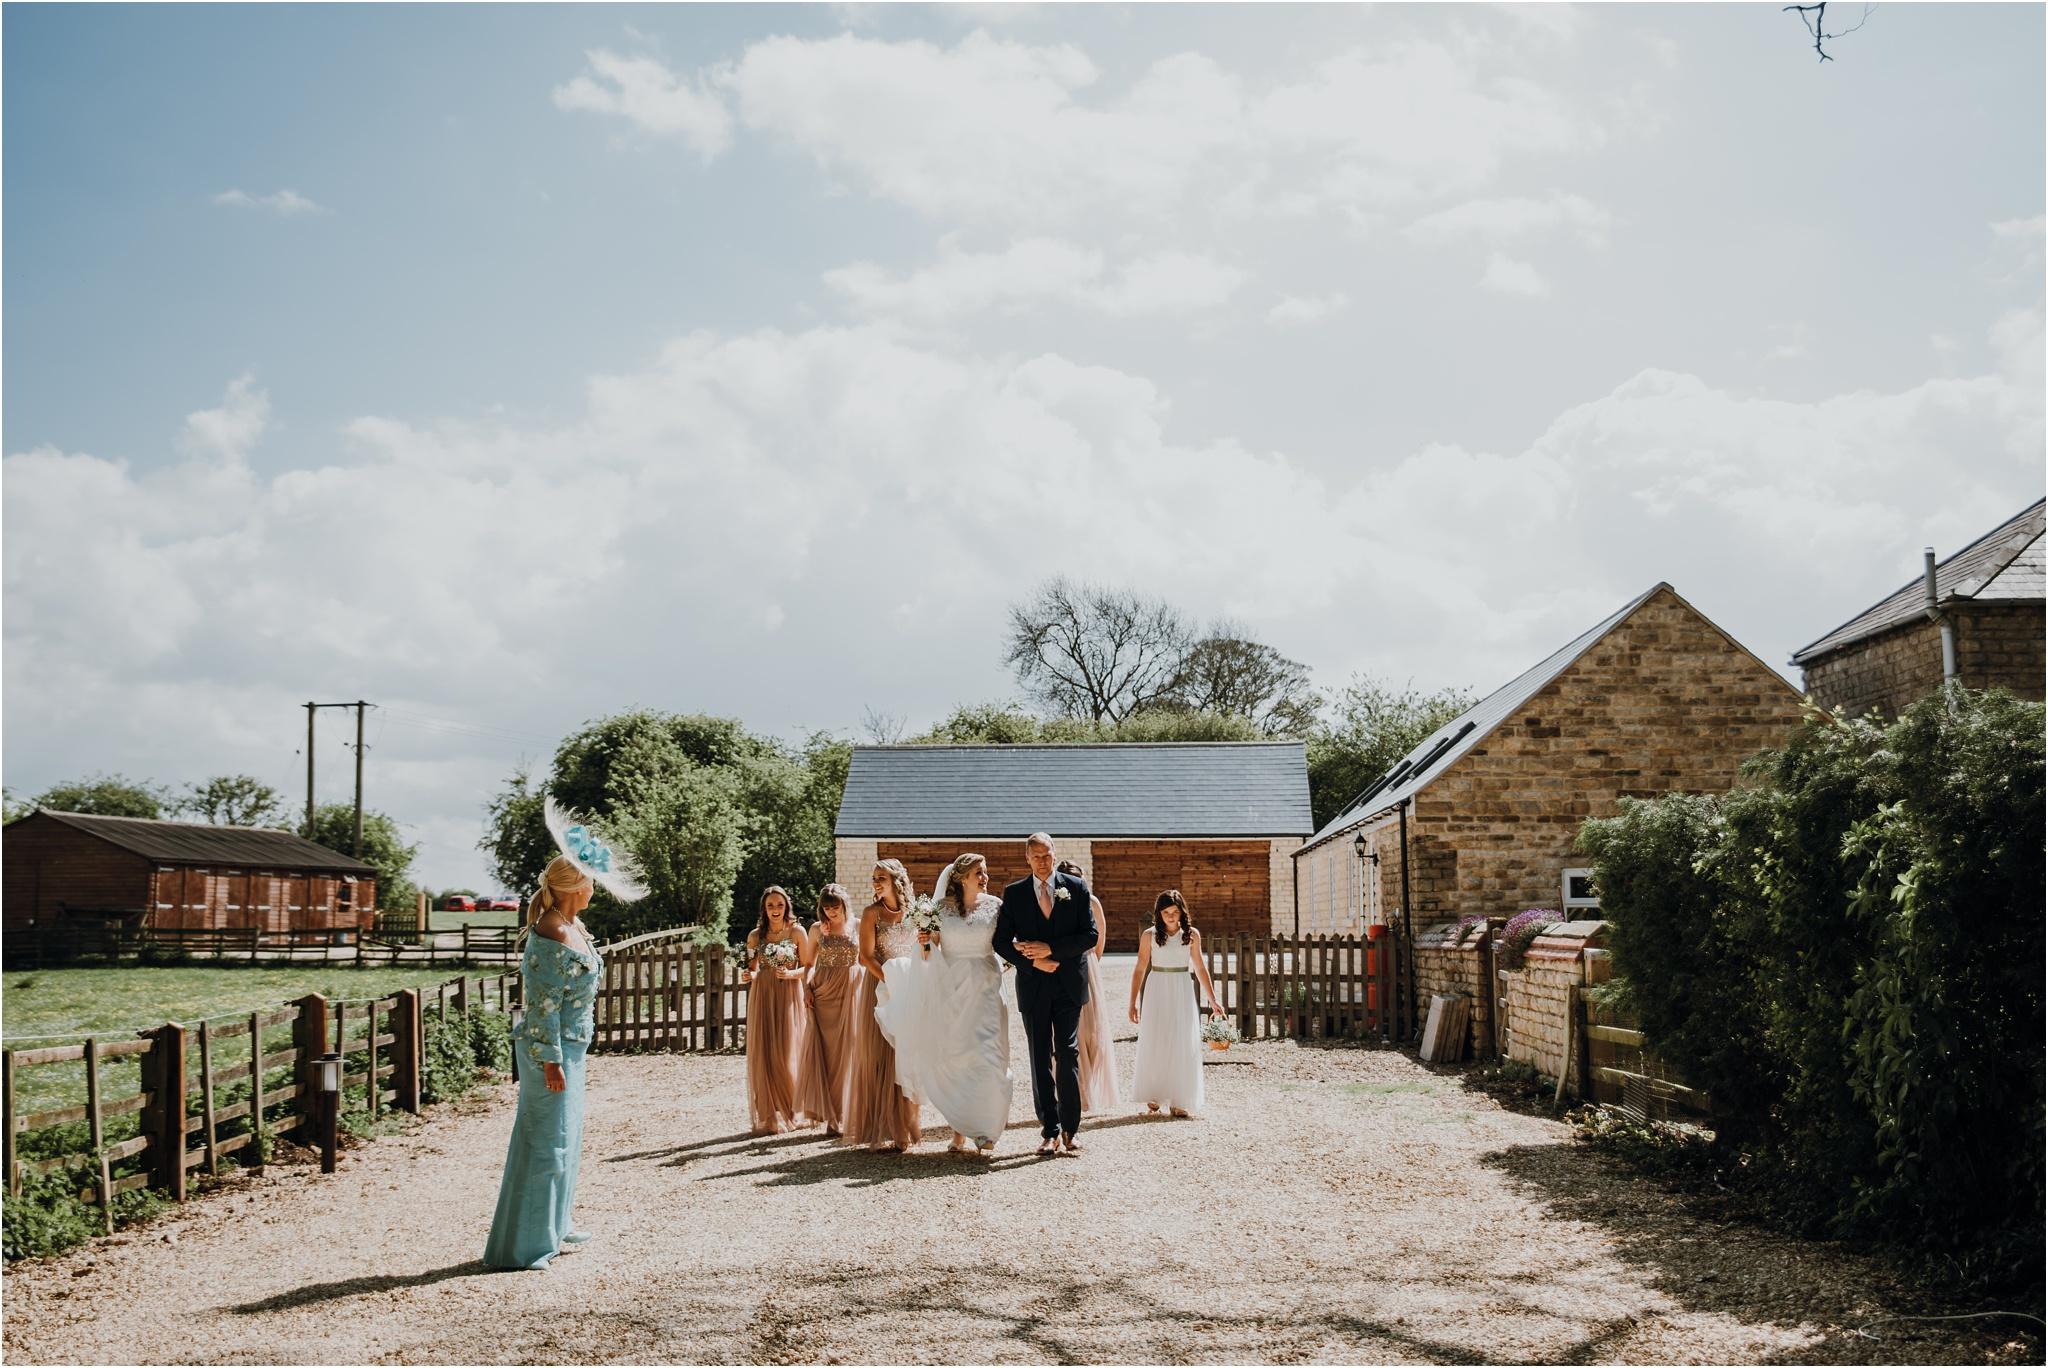 Outdoor-country-wedding-Edinburgh-photographer__0055.jpg